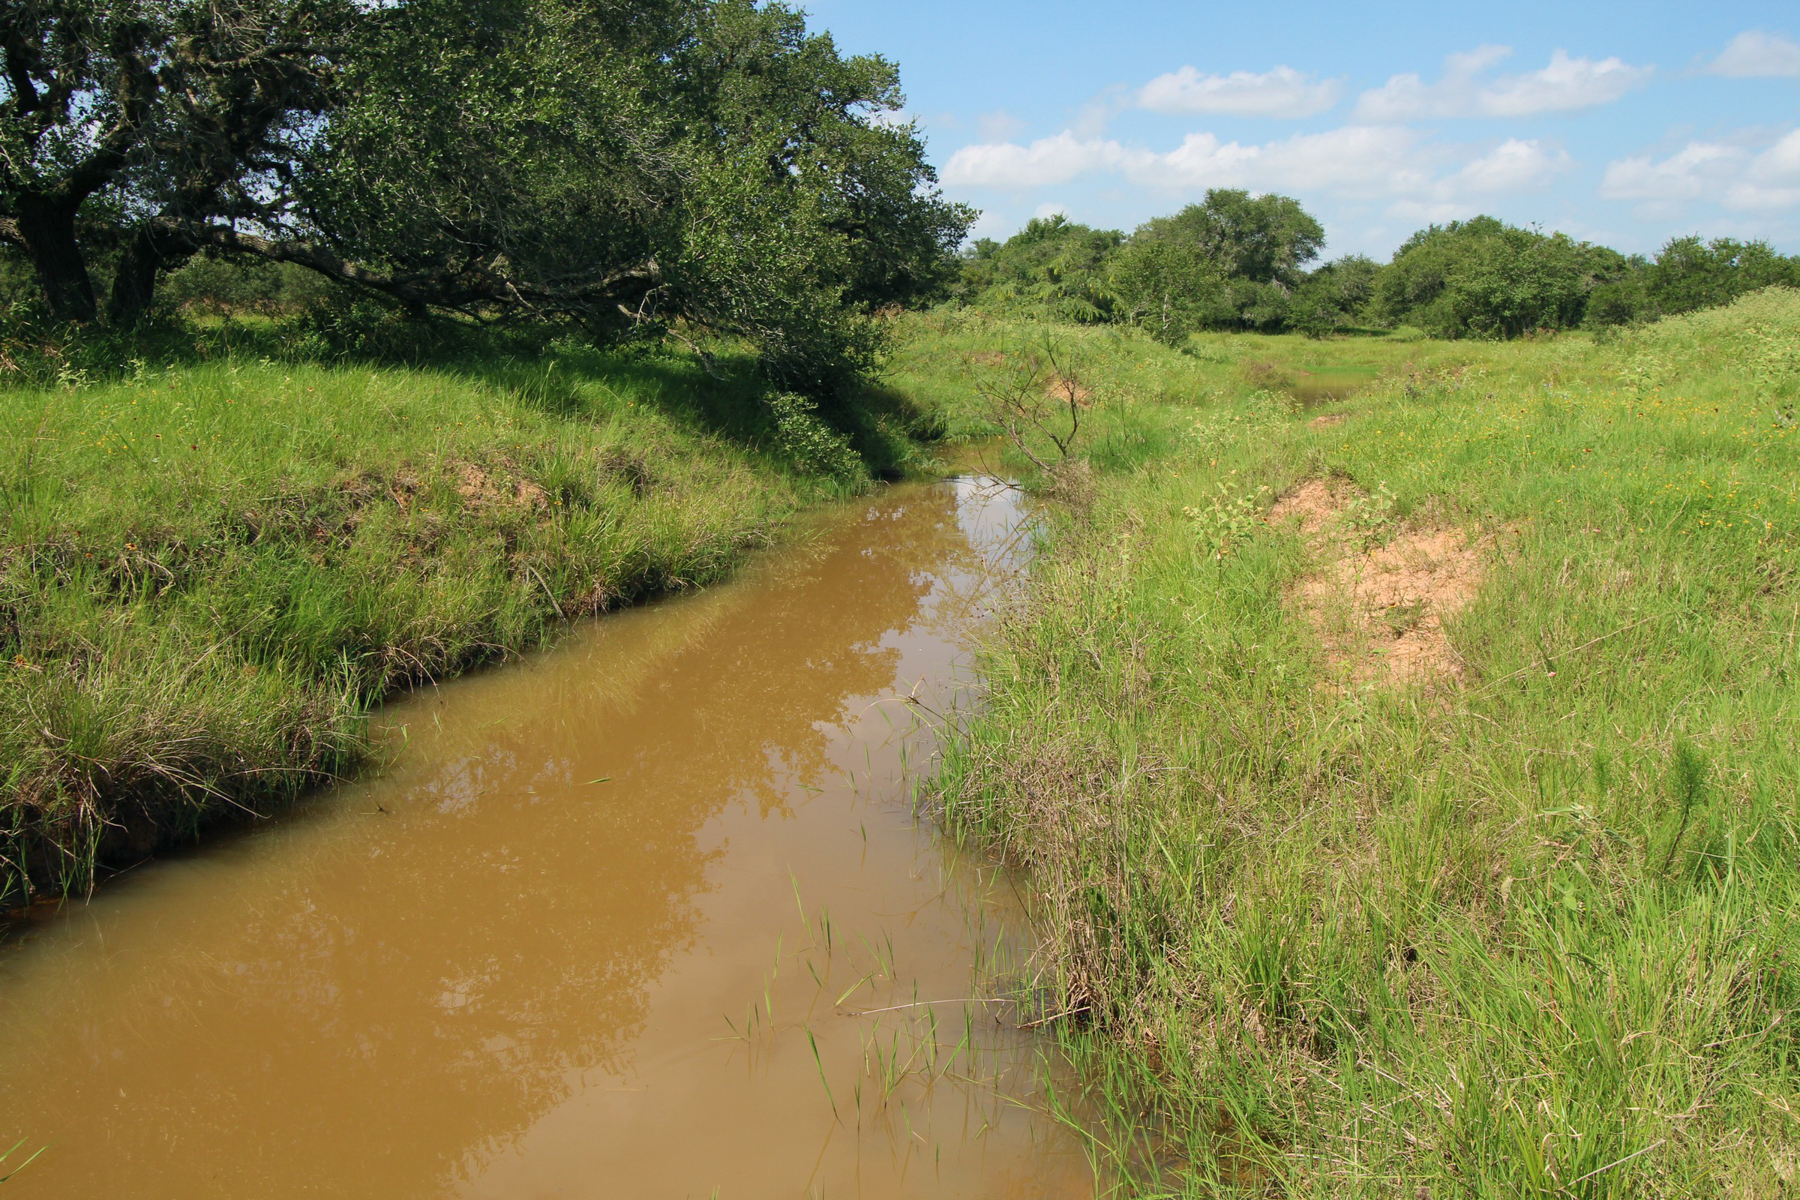 Additional photo for property listing at 894+/- Acrew Tri-County Ranch 894+/- AC / Tri-County Ranch ou Victoria, Texas 77901 Estados Unidos